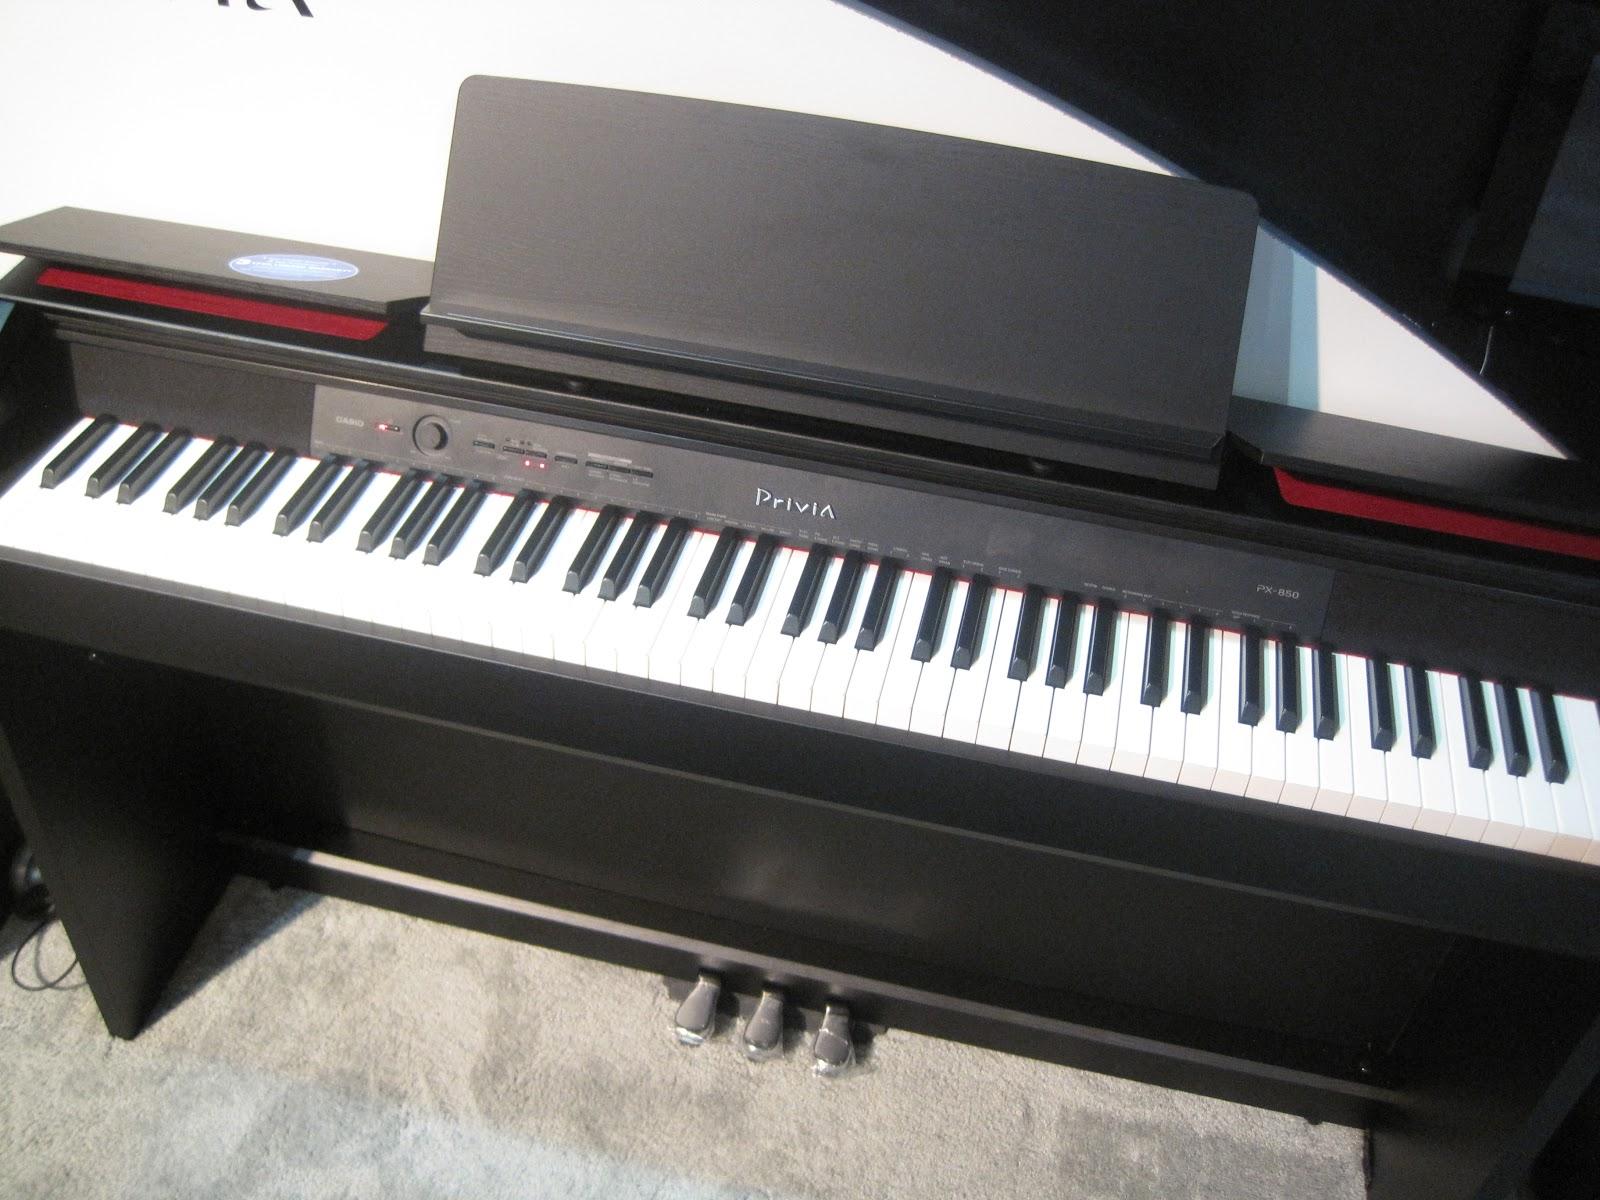 az piano reviews review yamaha p155 kawai ep3 roland fp7f kawai mp6 yamaha ydp162 yamaha. Black Bedroom Furniture Sets. Home Design Ideas